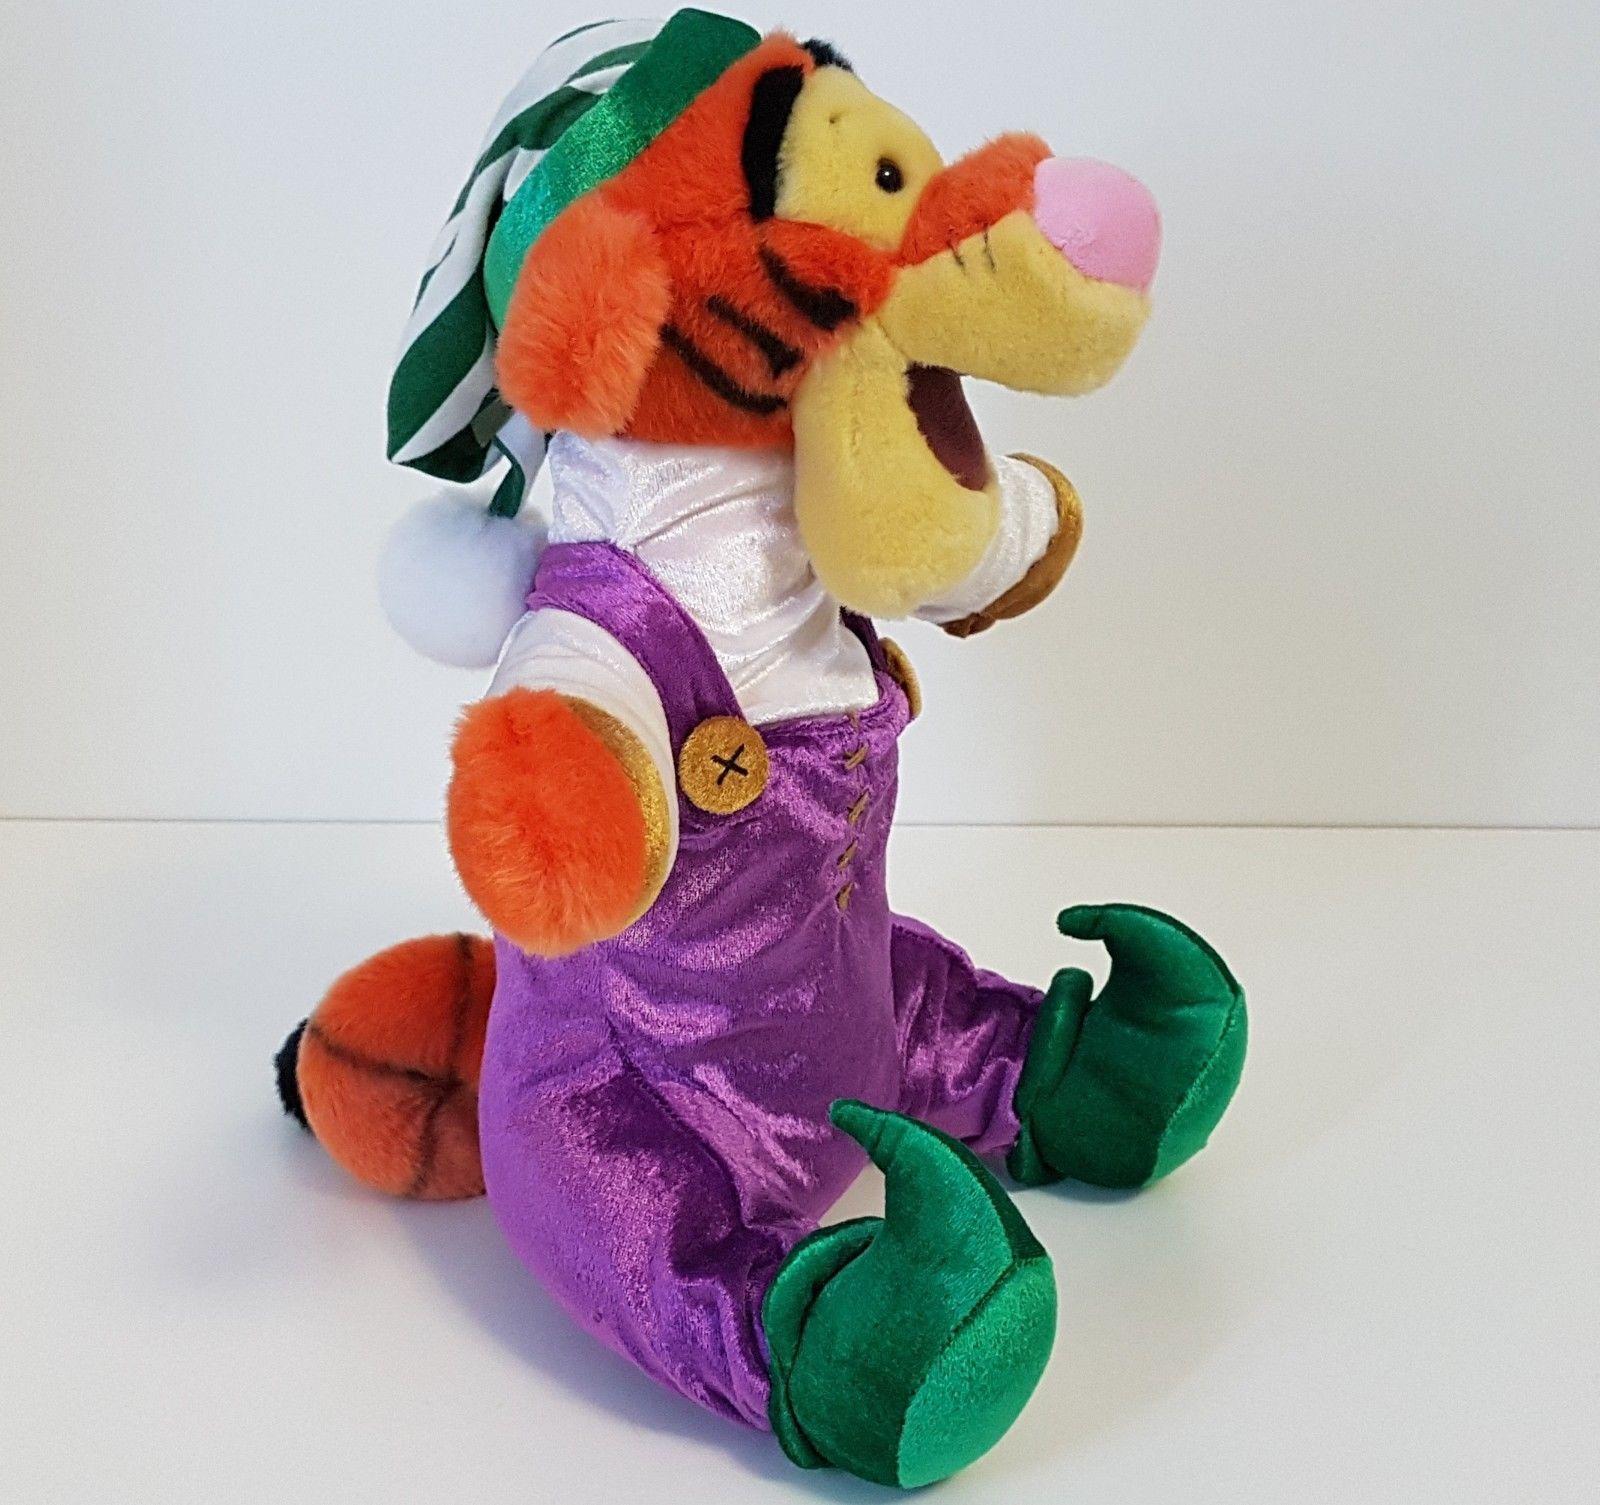 Tigger Elf Plush Toy Disney Store Exclusive Christmas Stuffed Animal